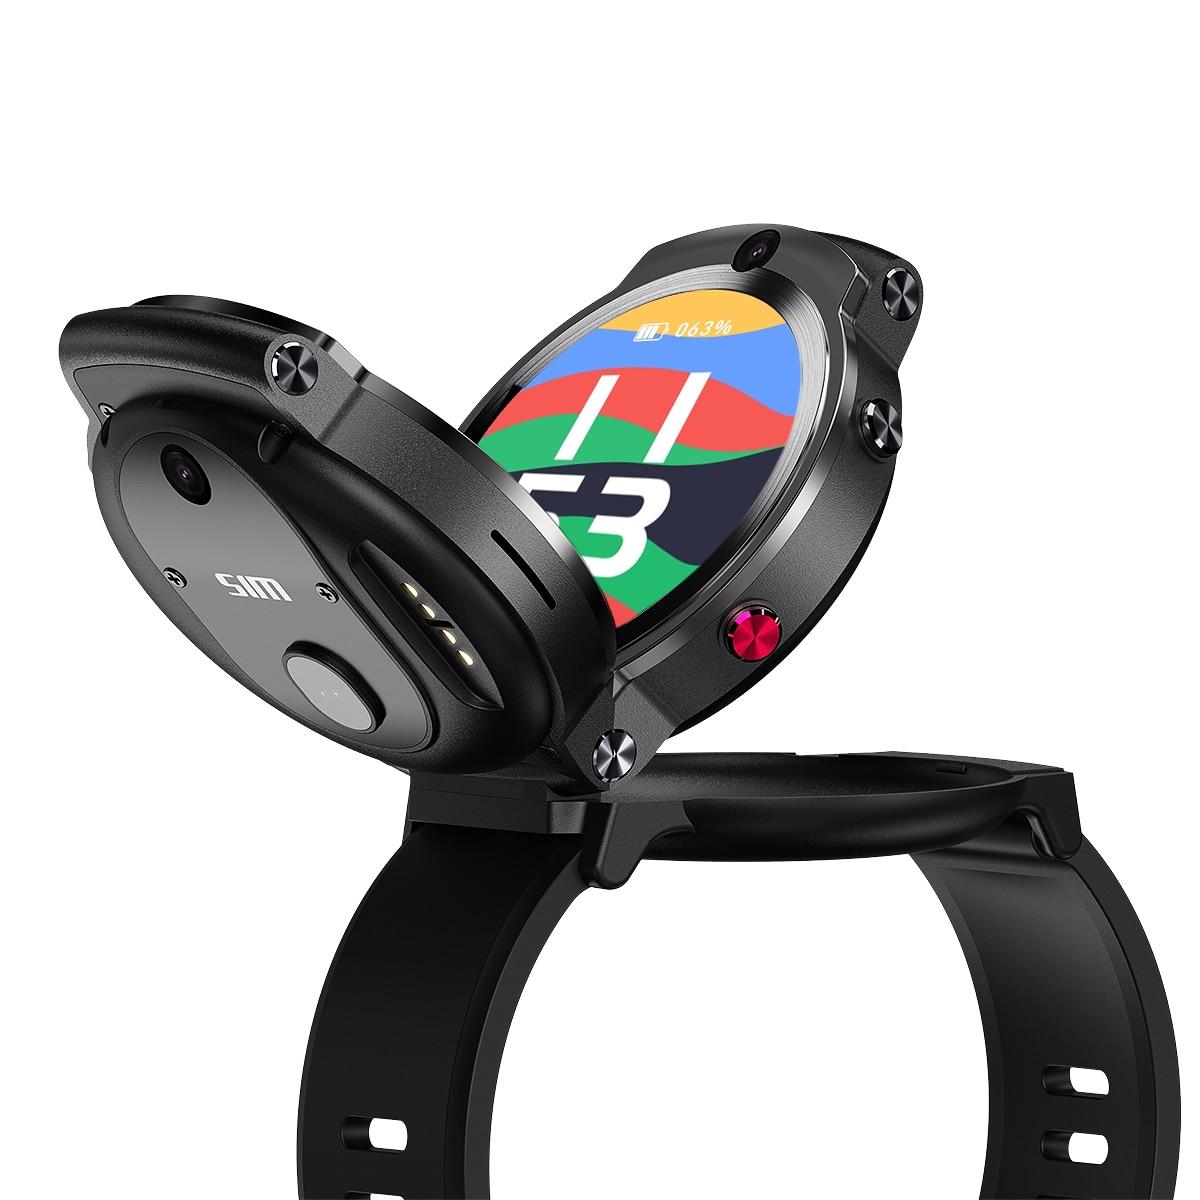 china fitness sport android IOS reloj W26 X7 X6 t500 bracelet phone bluetooth DM28 smart watch